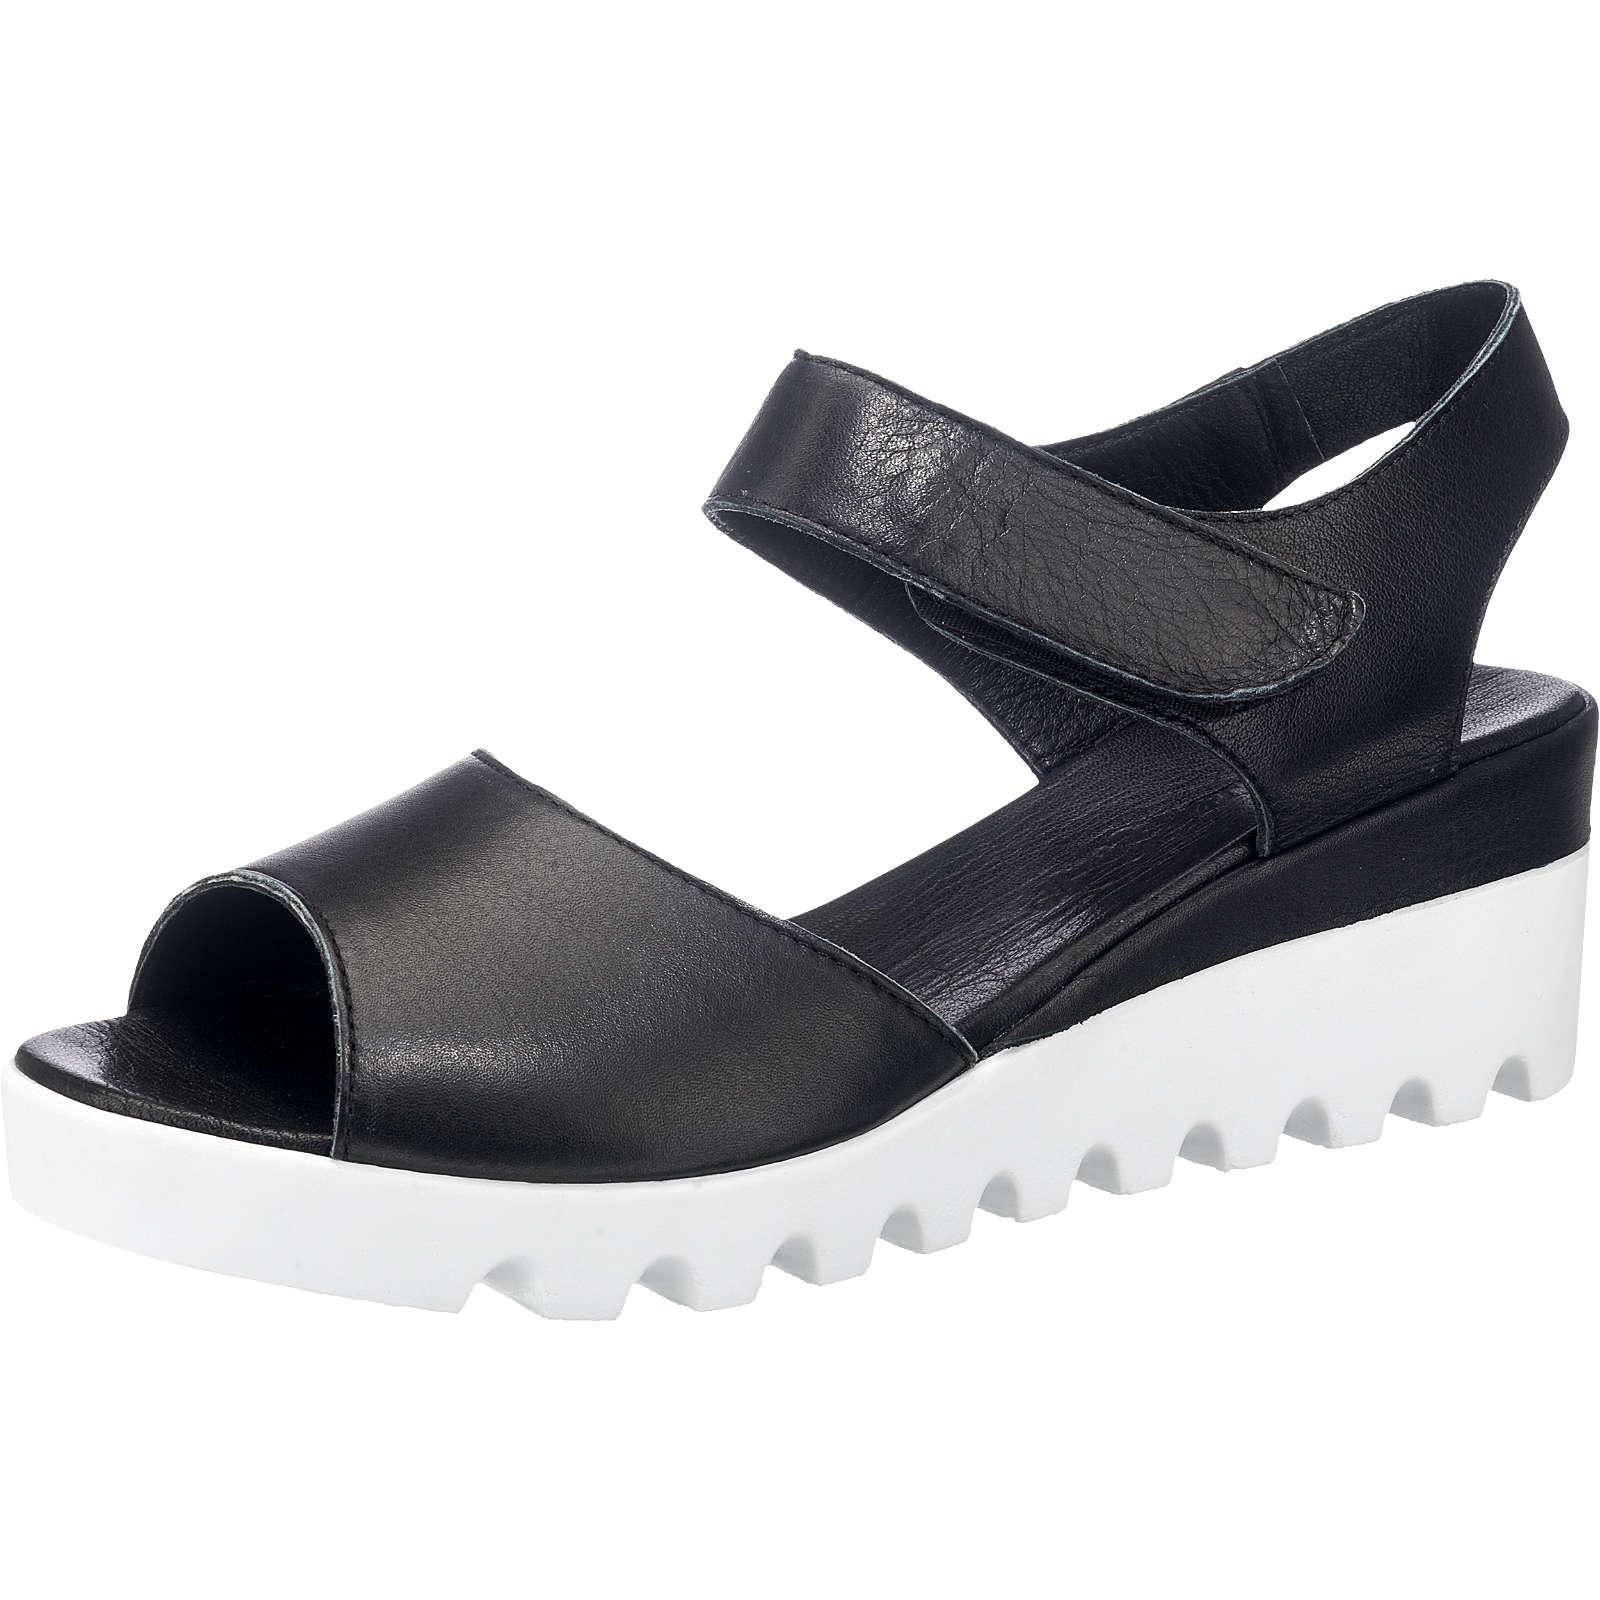 Andrea Conti Sandaletten schwarz Damen Gr. 37 jetztbilligerkaufen